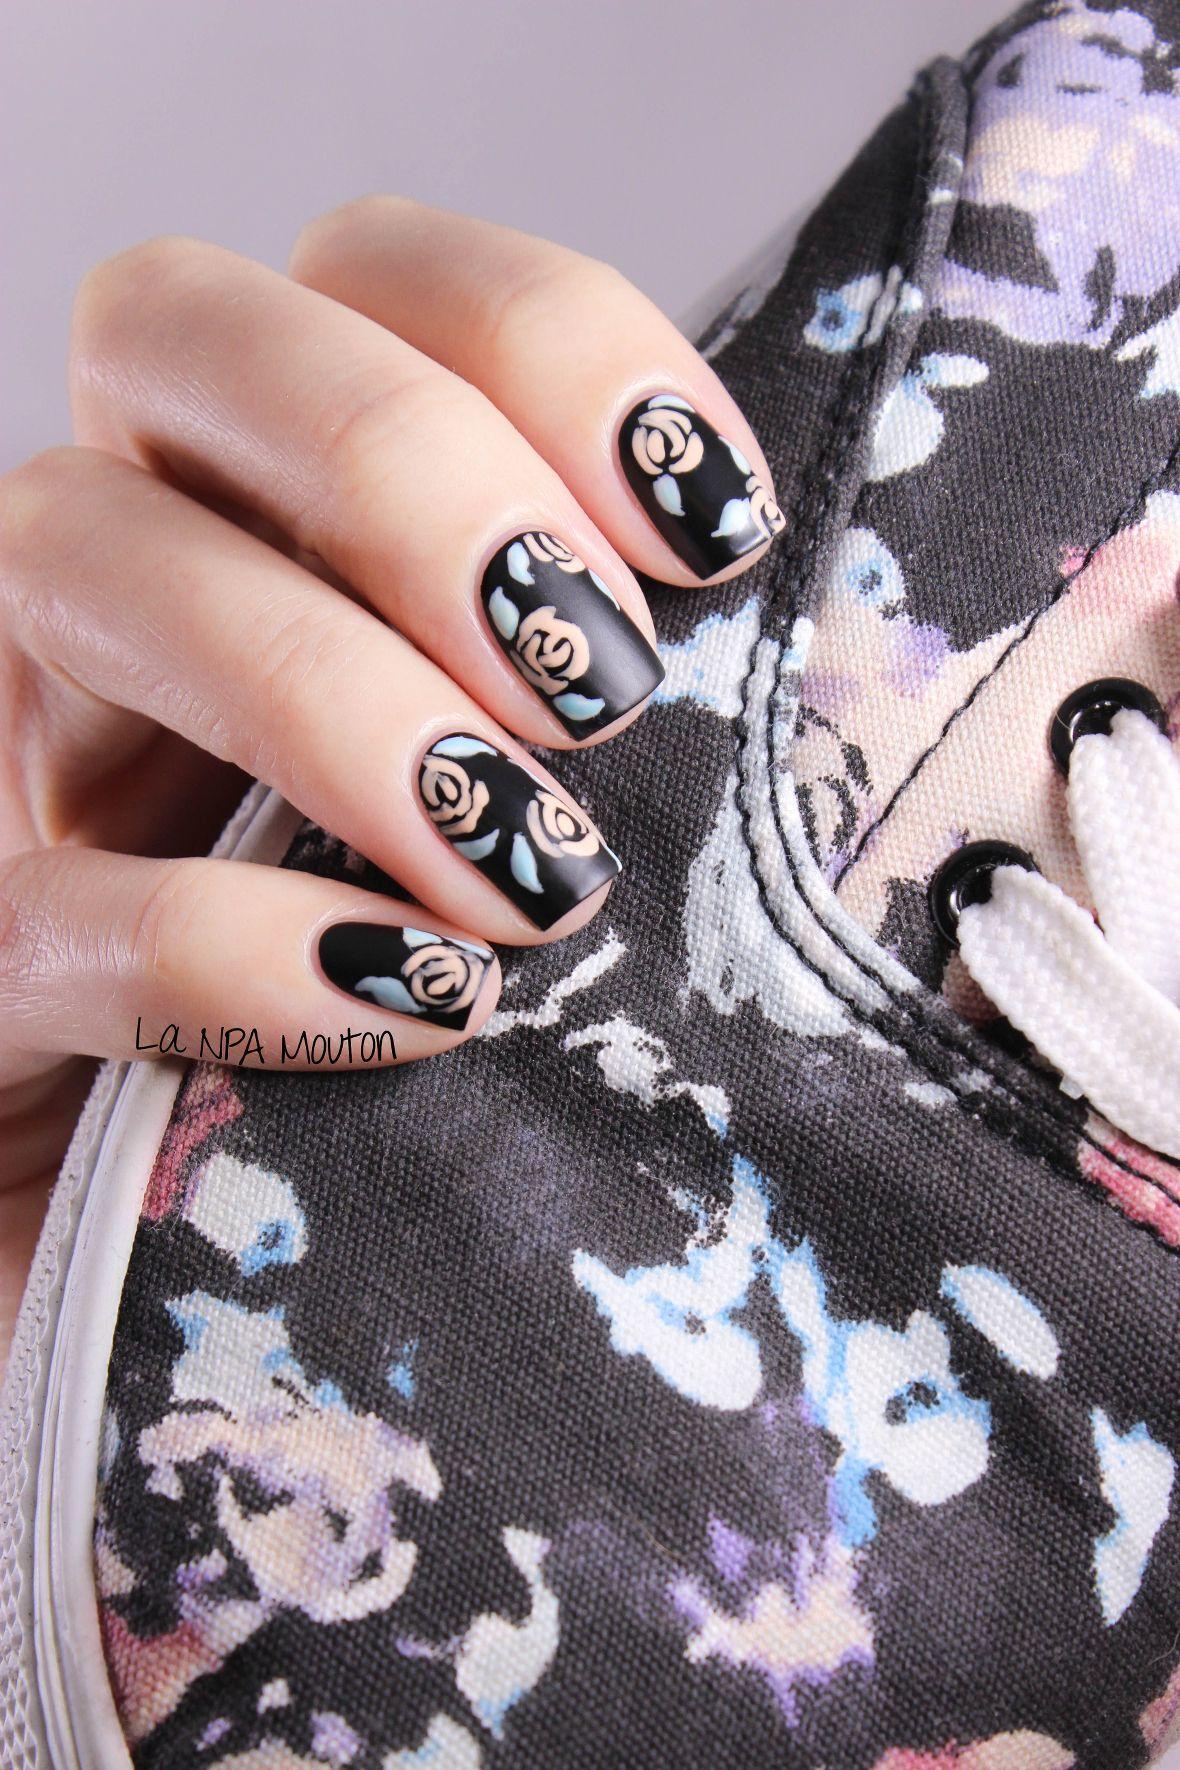 Nailstorming x Sneakers Inspired Nails - Vintage Roses 2 | Nail Art ...